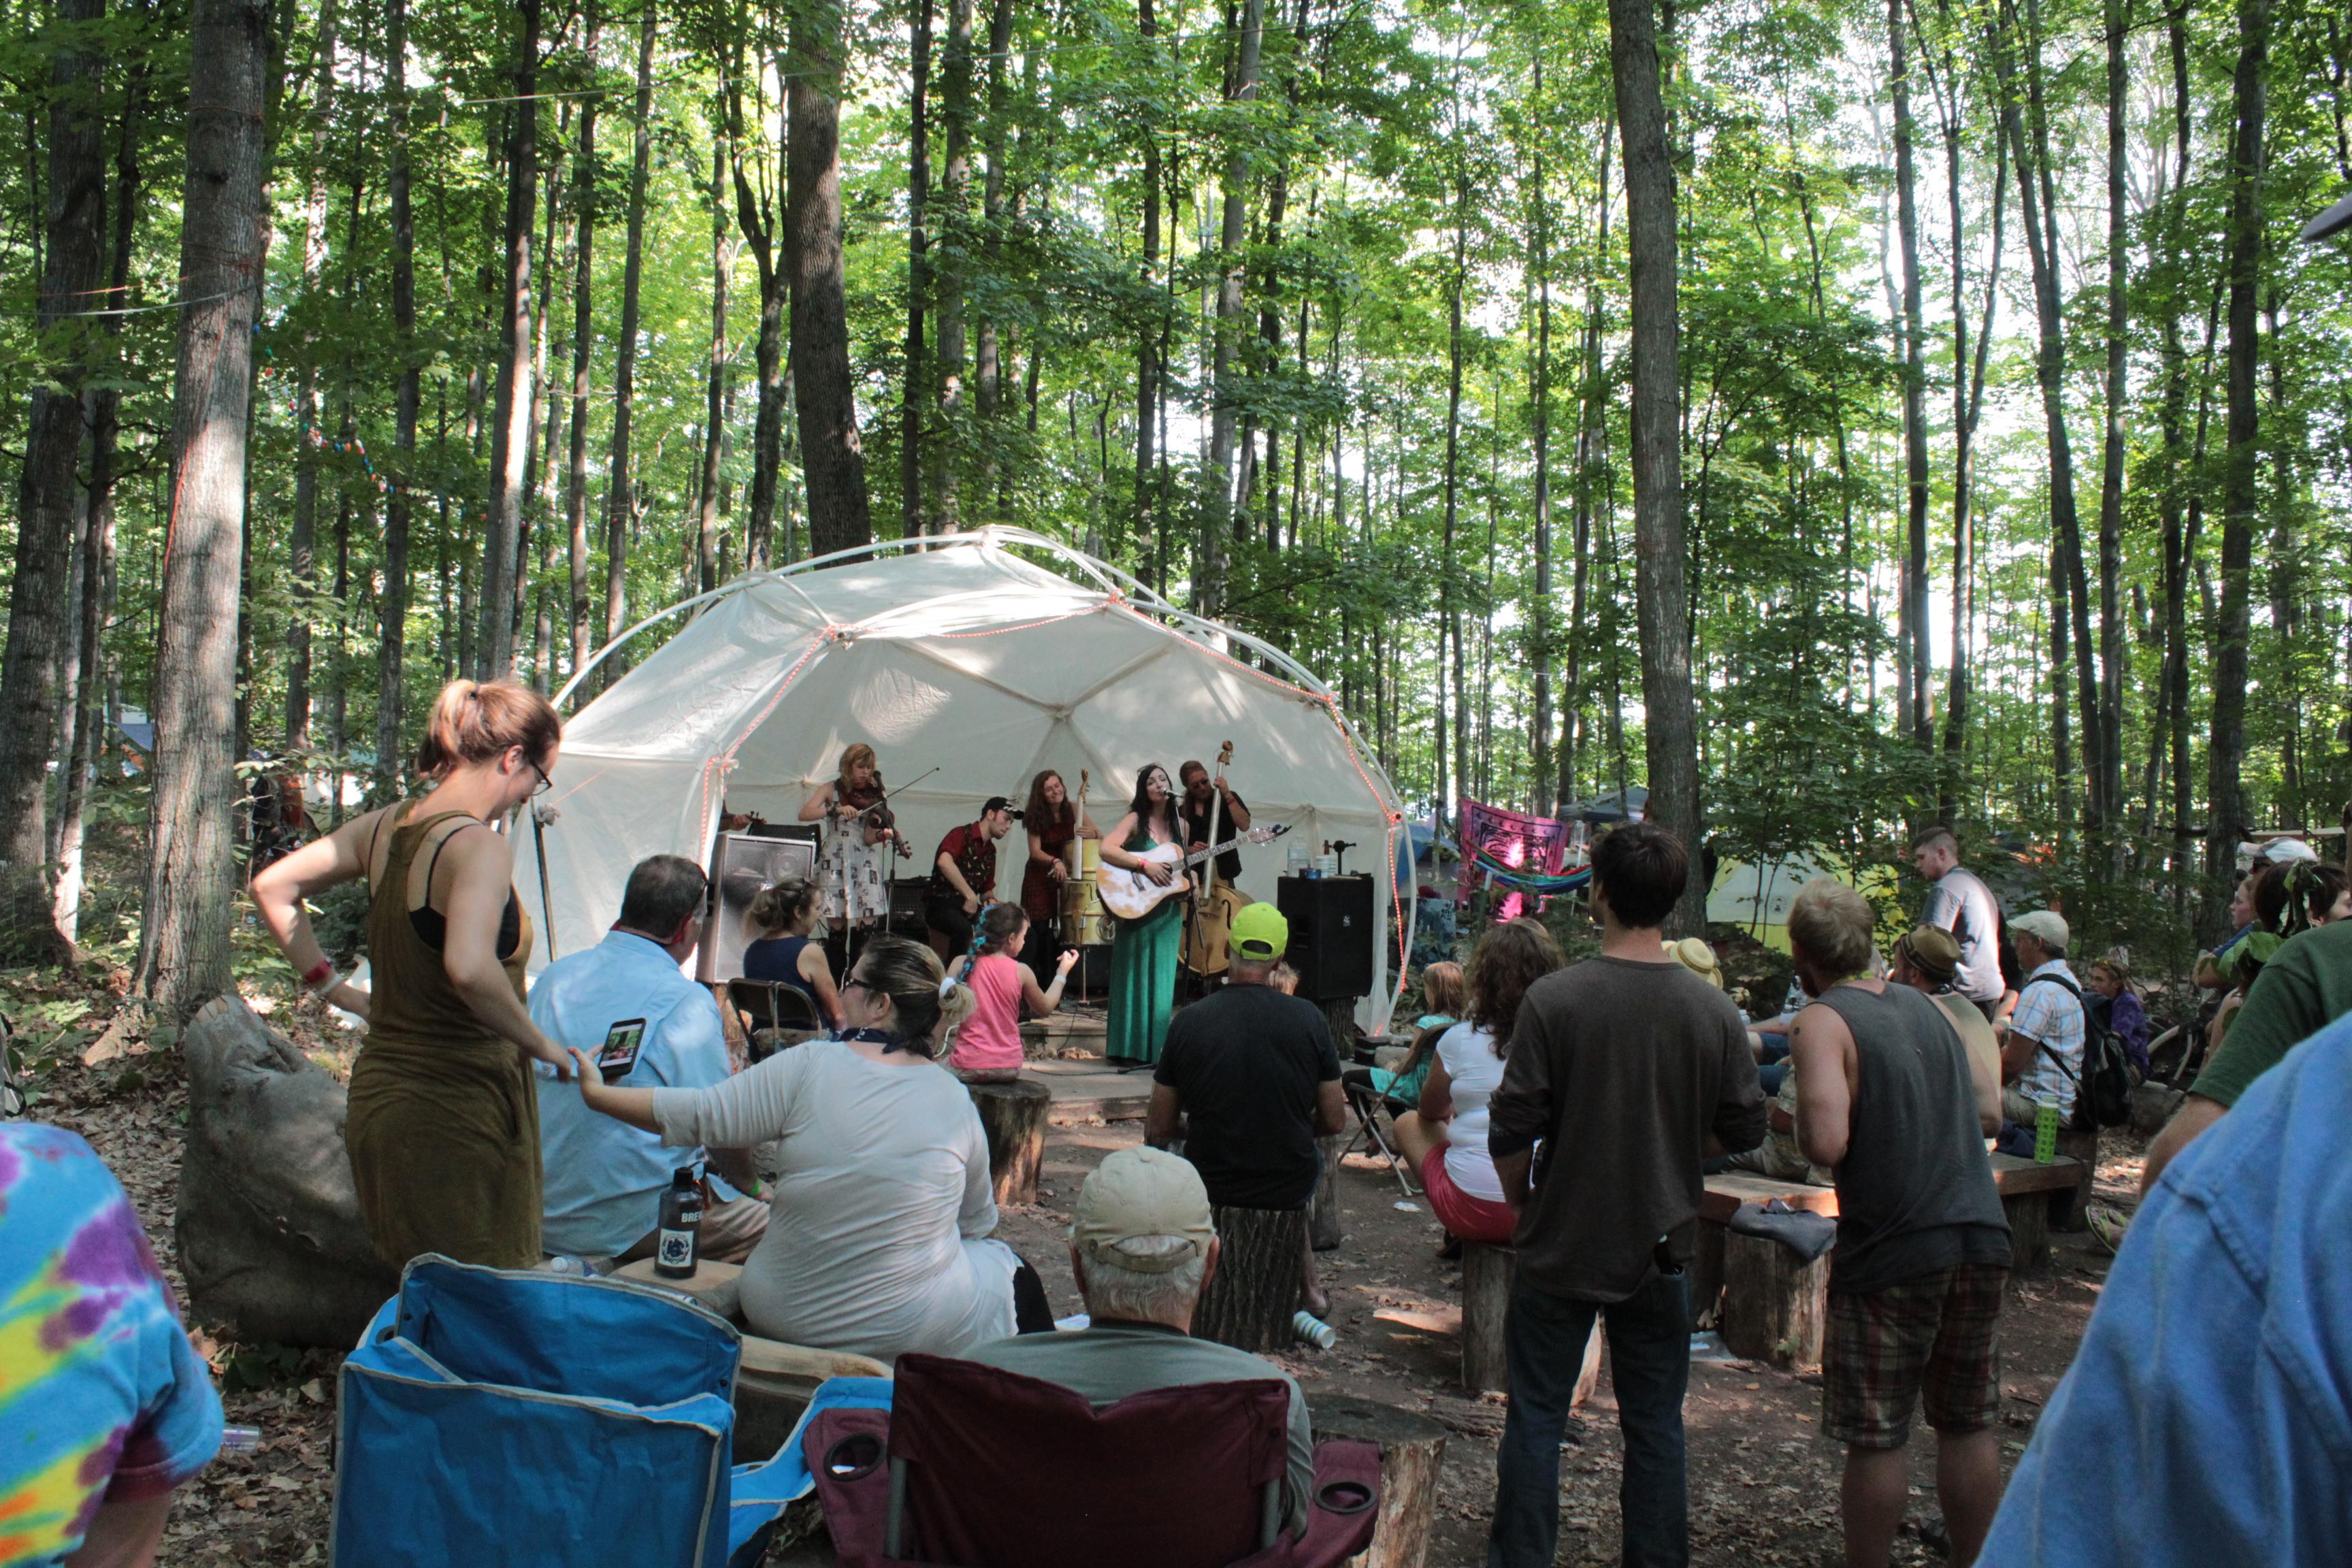 Michigan's Top 10 Summer Music Festivals: The Local Spins List